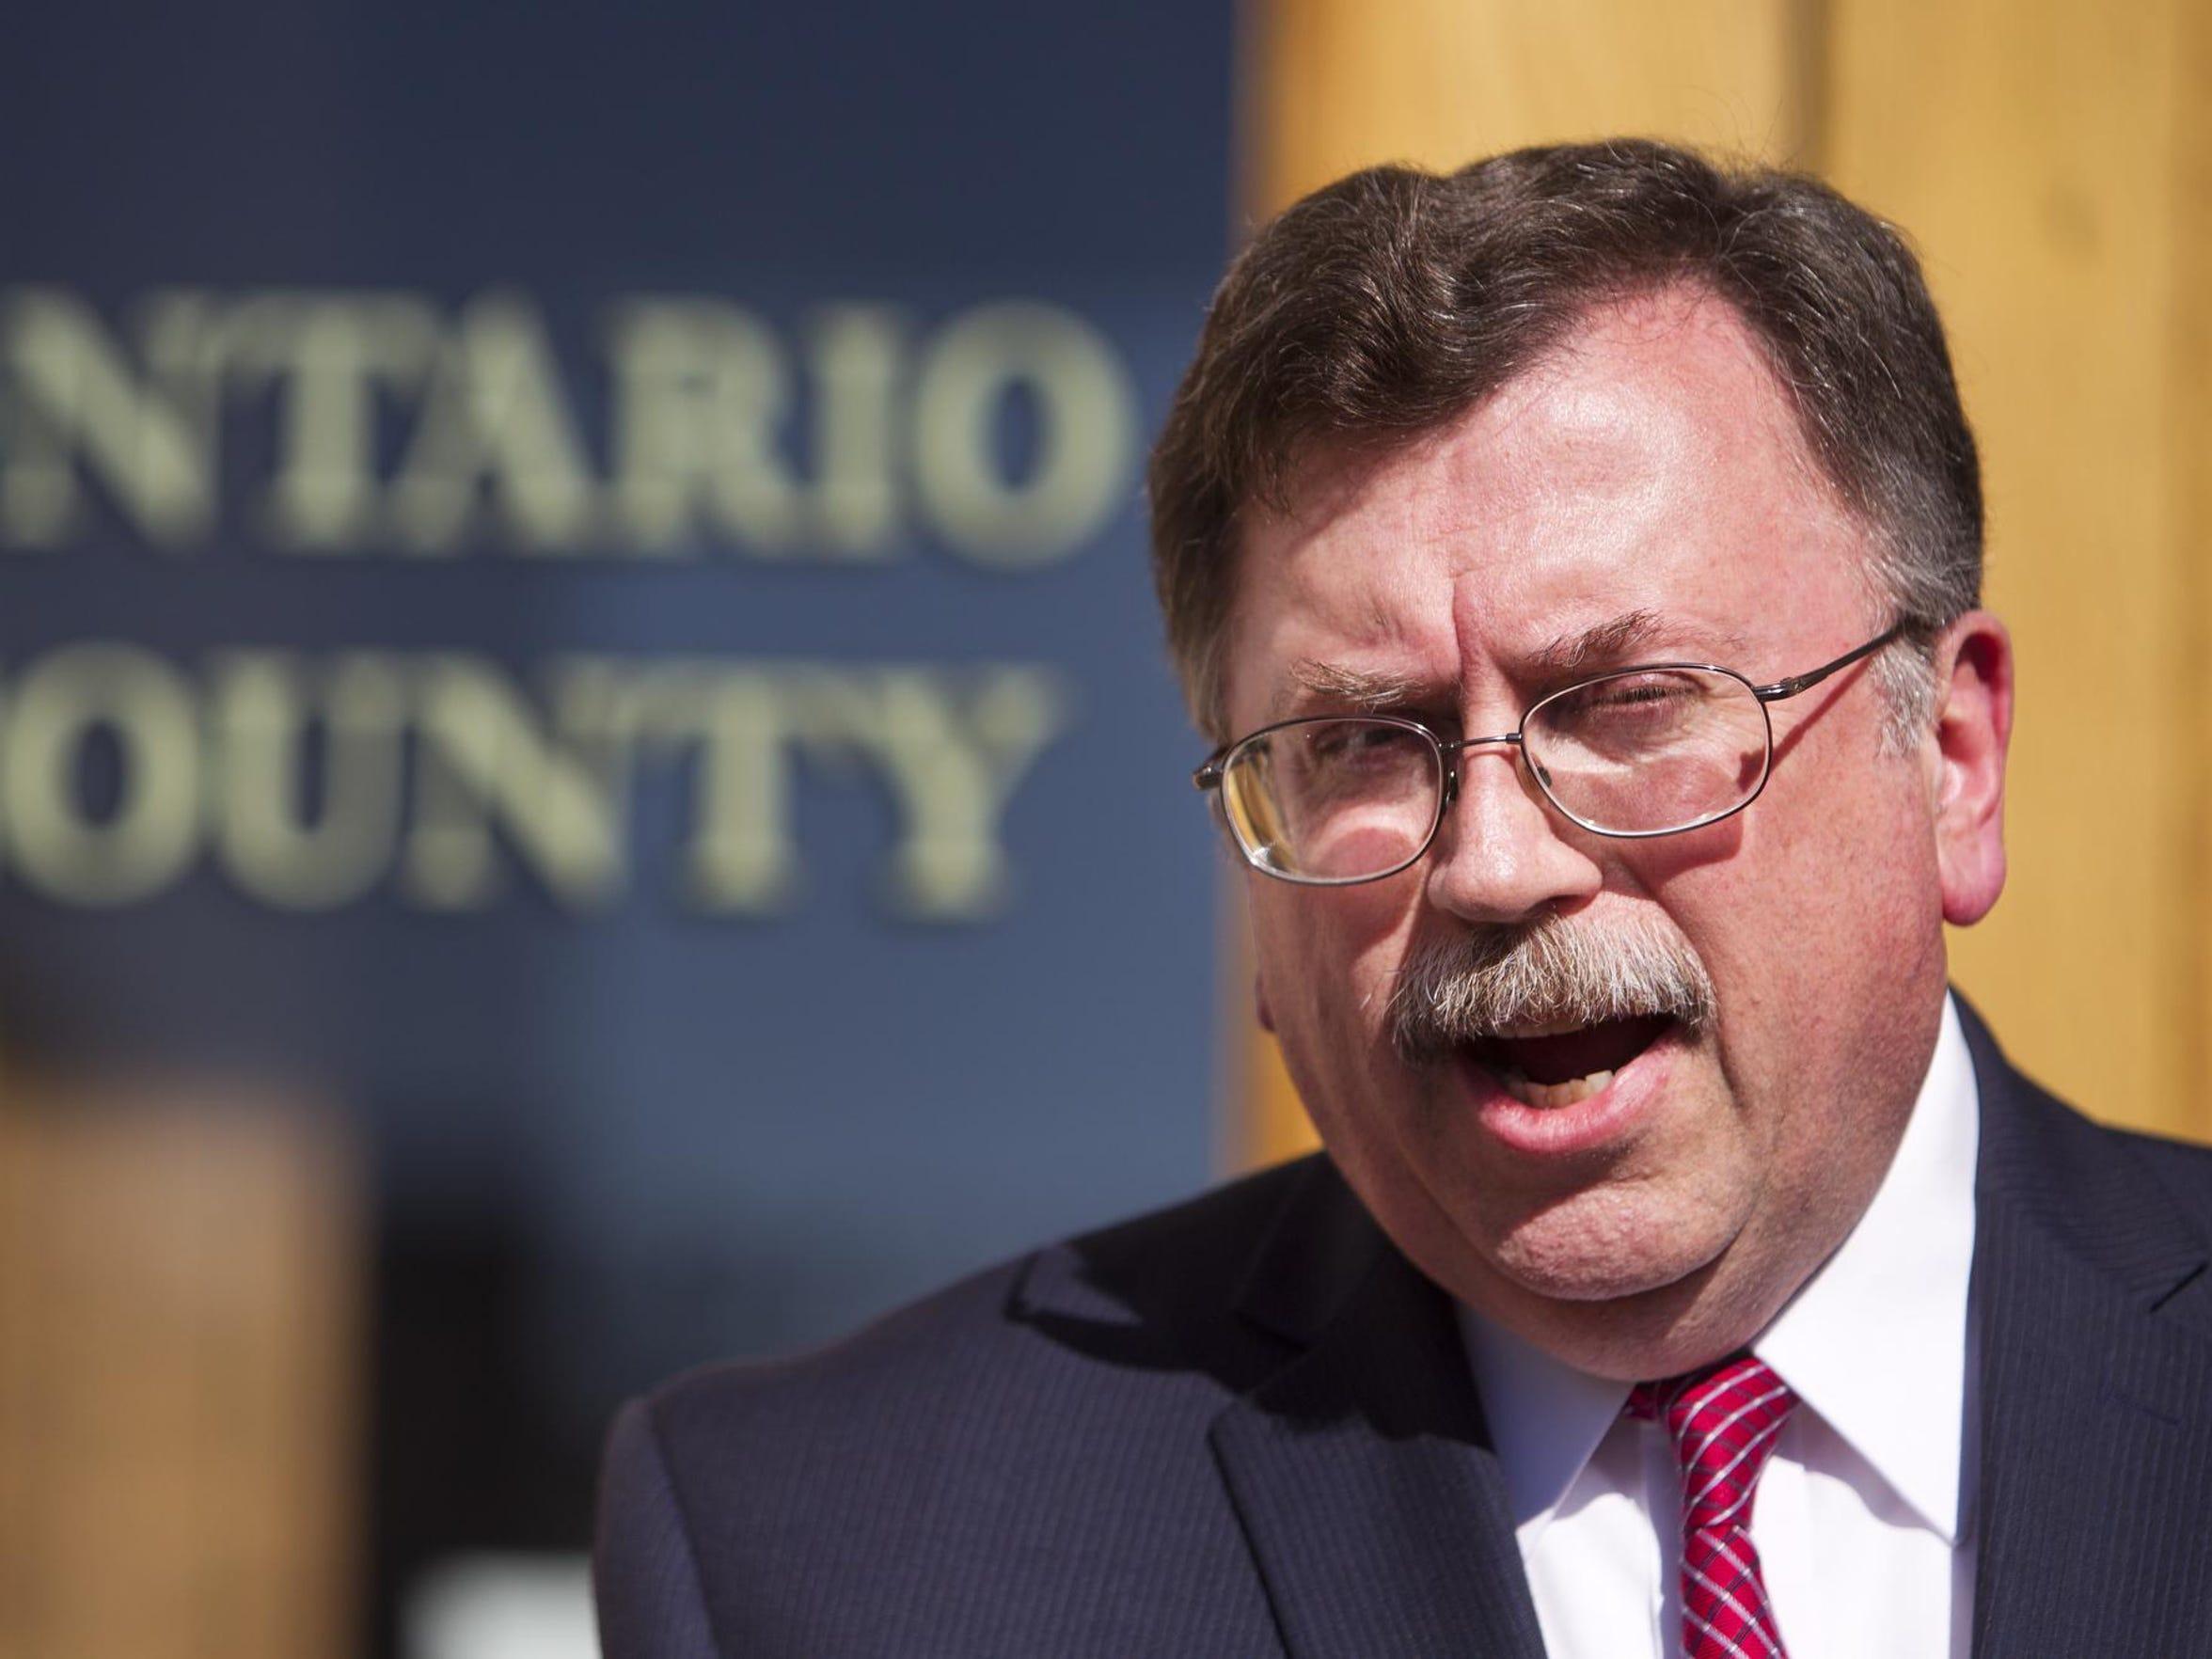 Ontario County District Attorney Michael Tantillo states